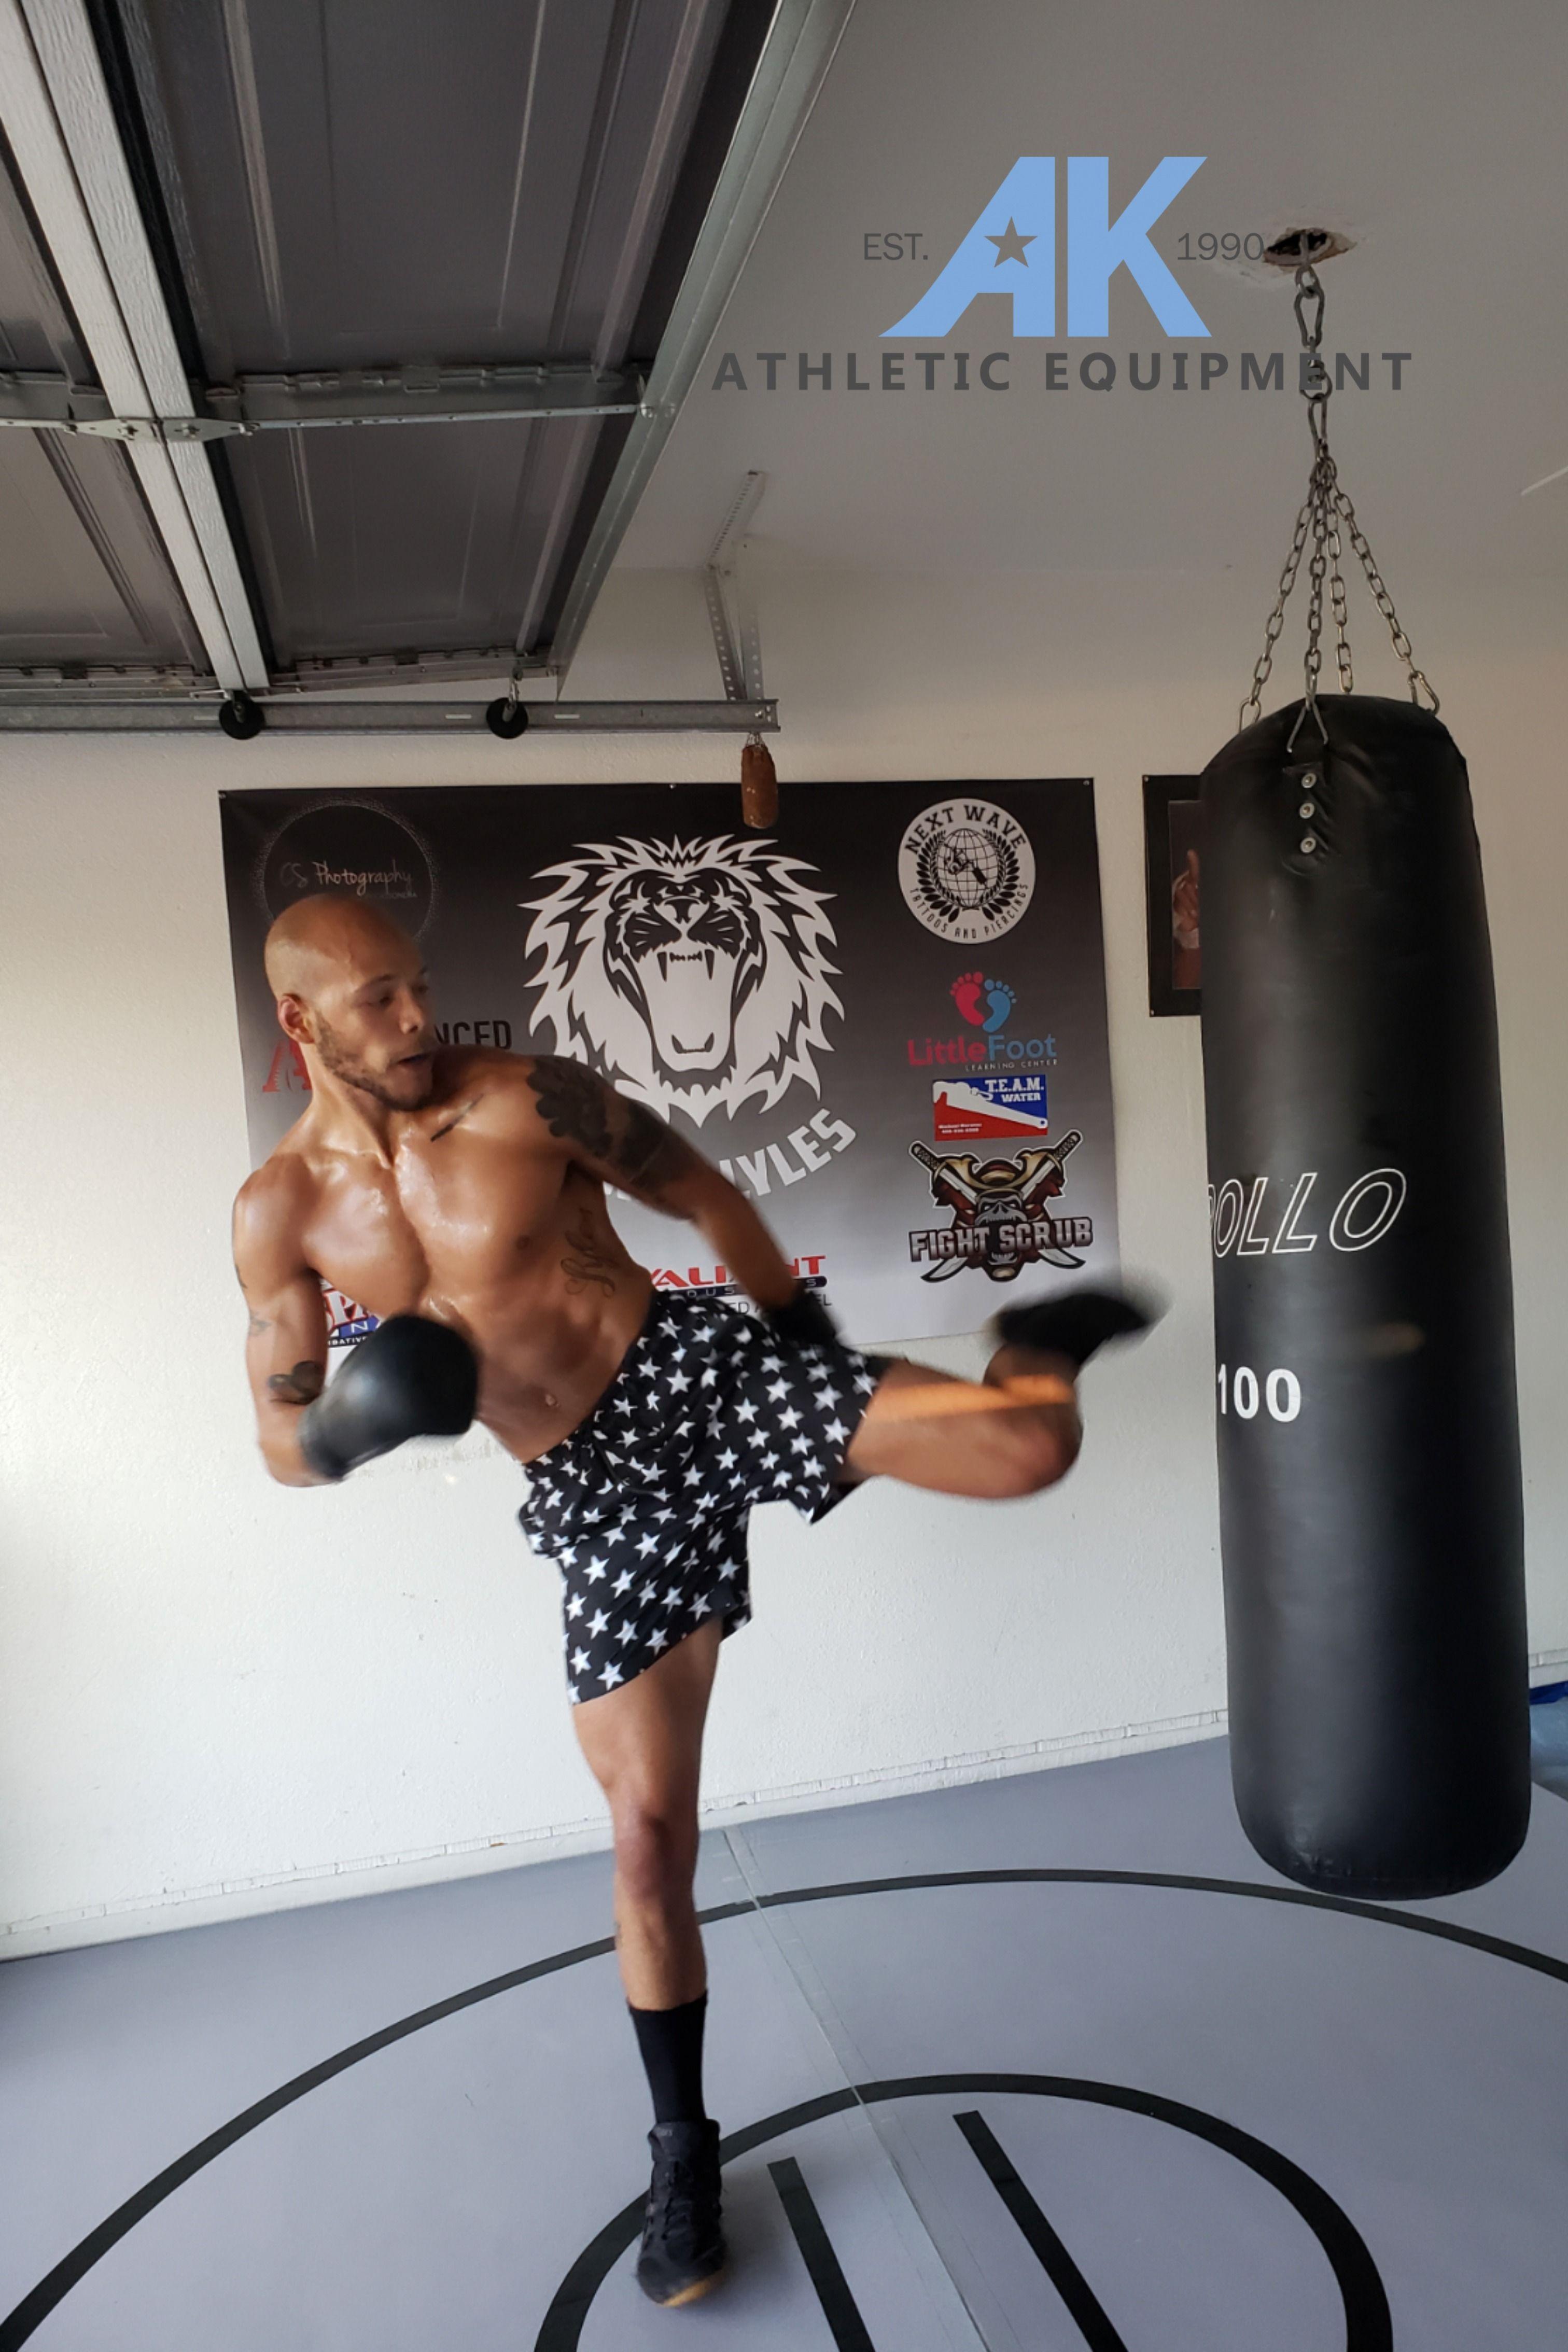 8 X 8 X 1 3 8 Roll Up Wrestling Mat In 2020 Boxing Gym Home Gym Design Garage Gym